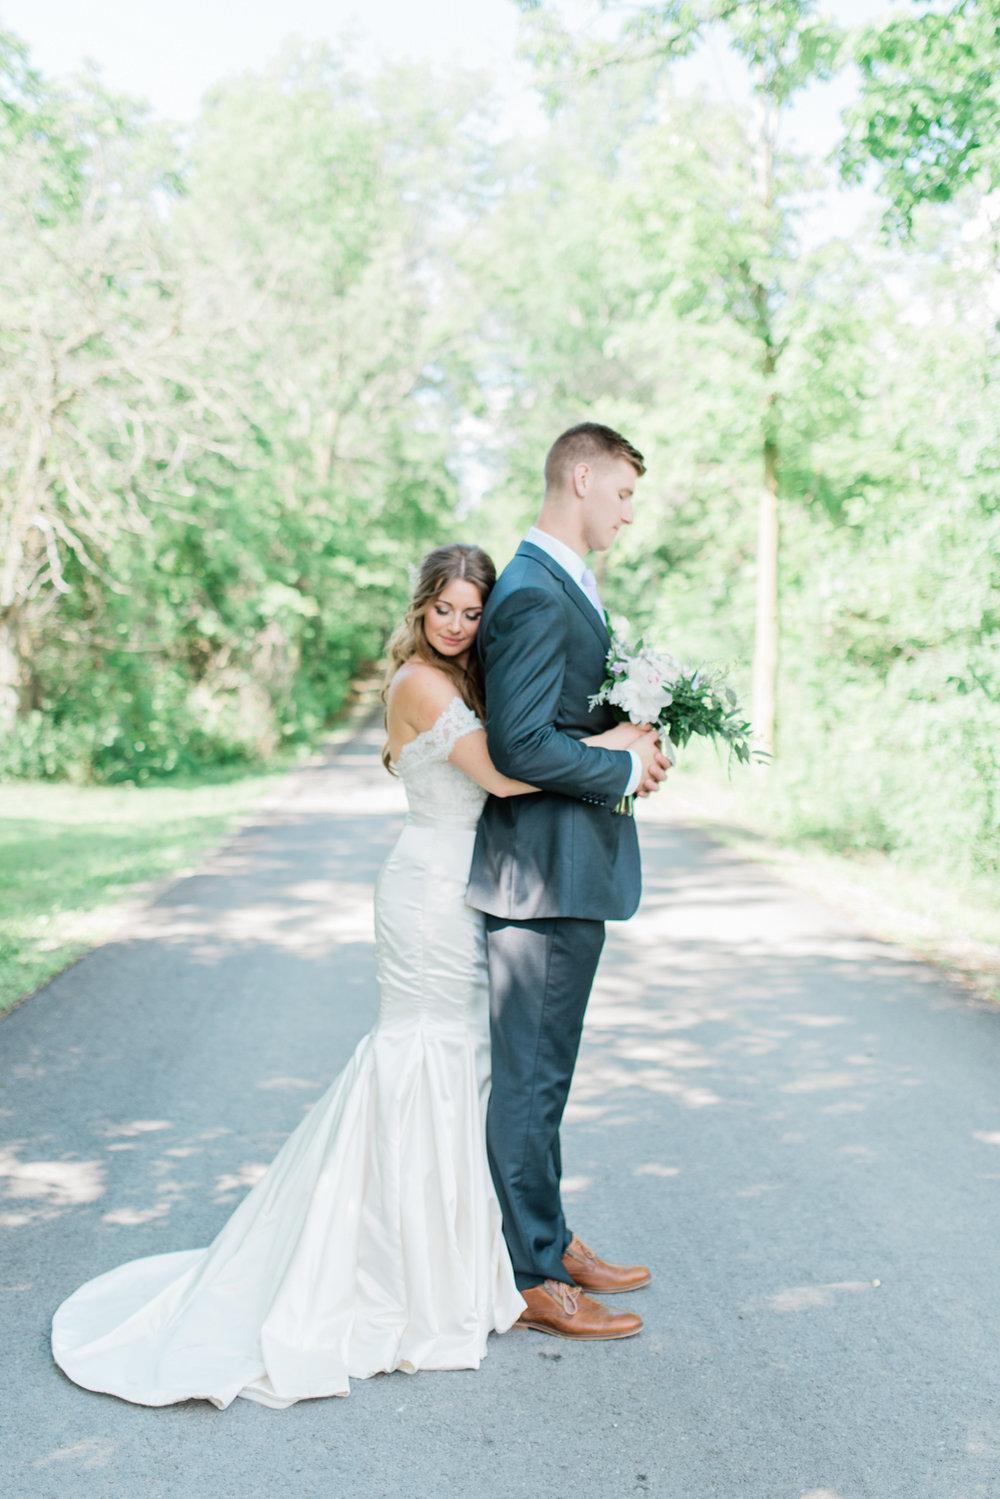 Hamilton Destination Wedding Photographer -23.jpg